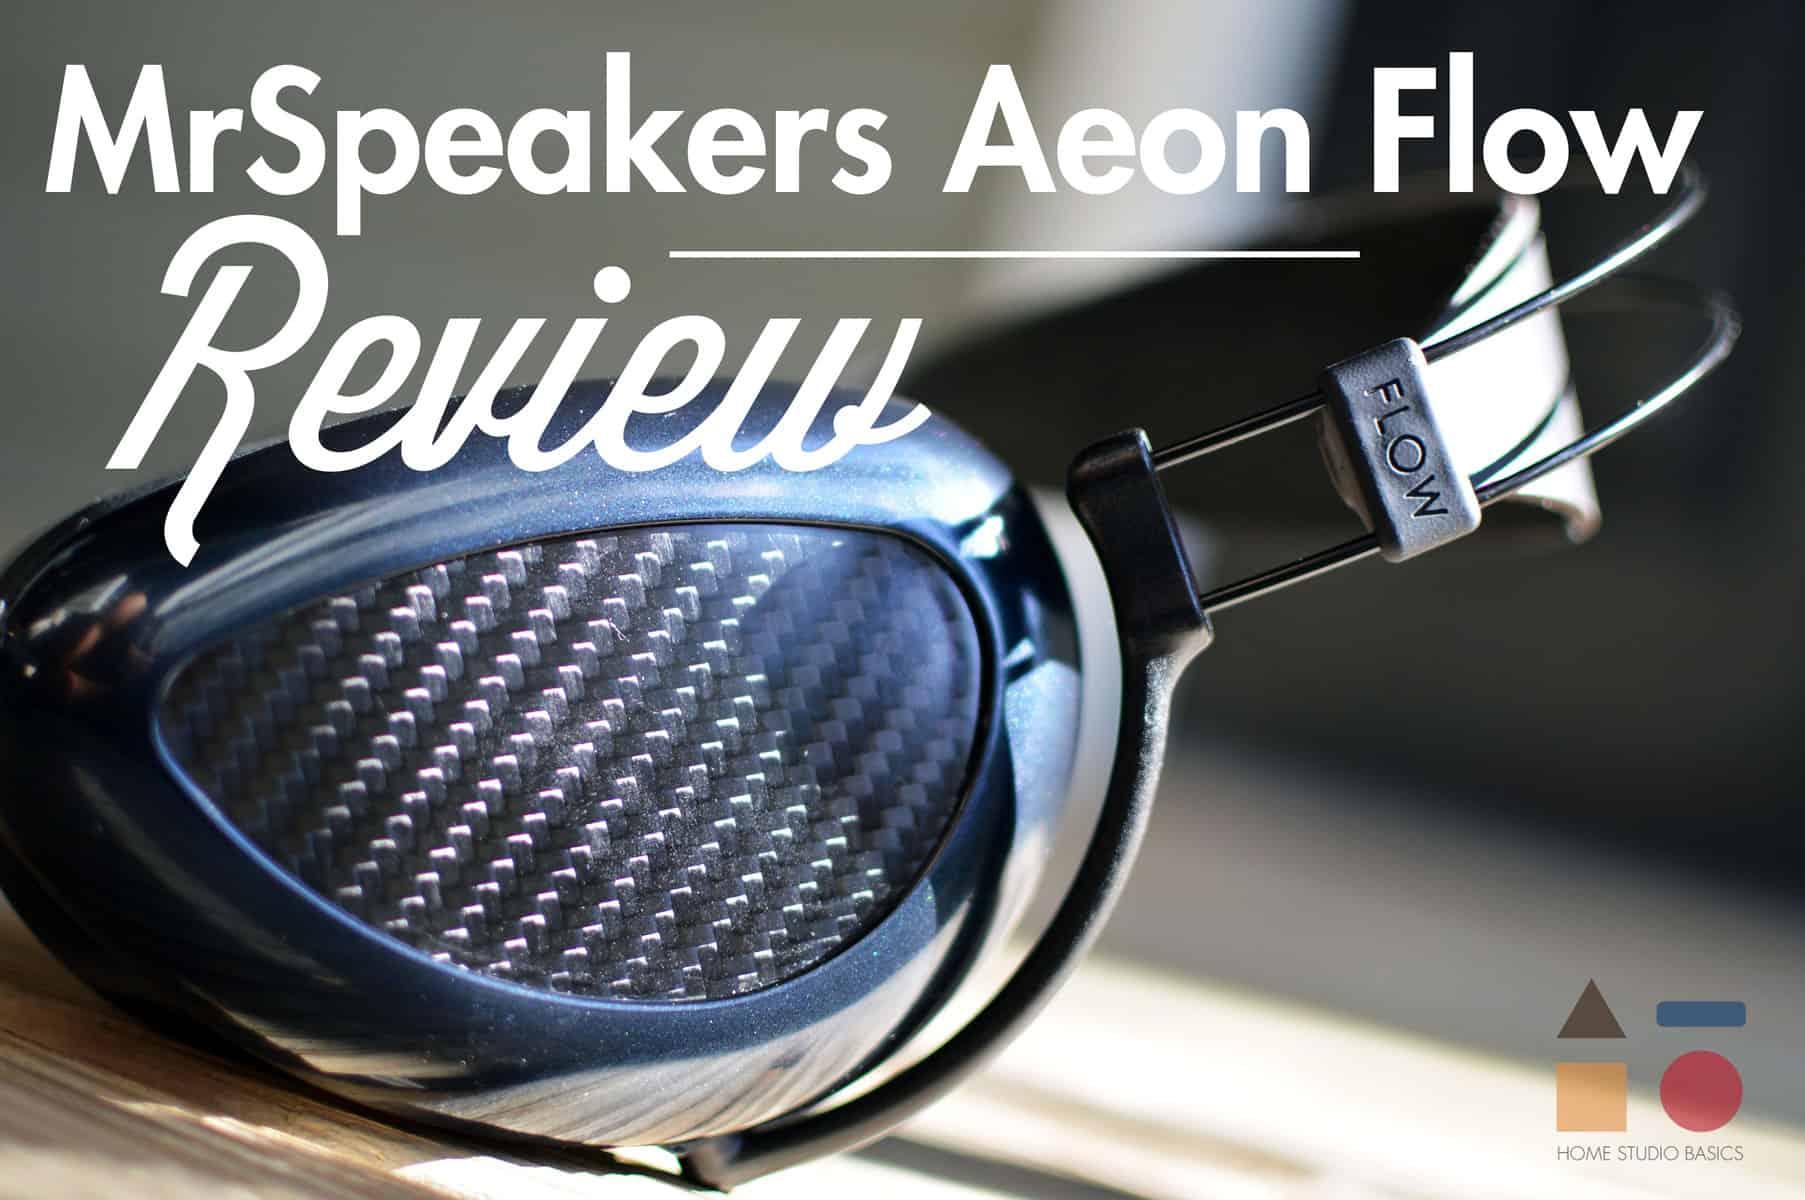 MrSpeakers Aeon Flow Review